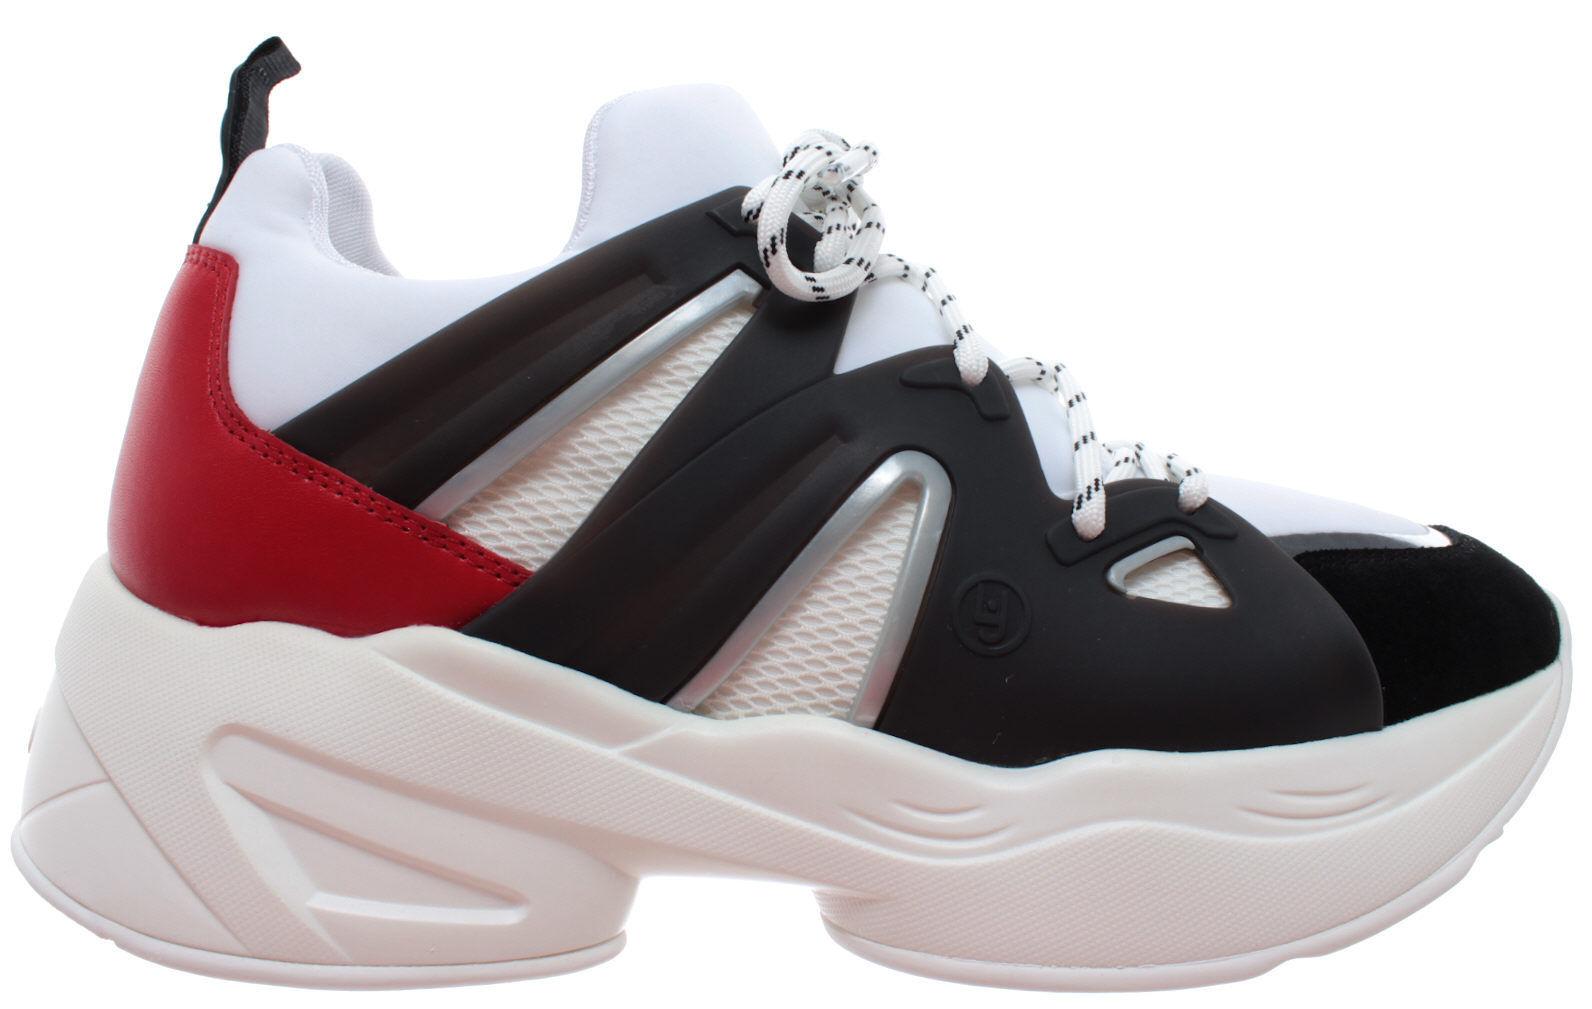 LIU JO Milano Jog 07 Sock Leather Lycra Black White Red Women's shoes Sneaker New